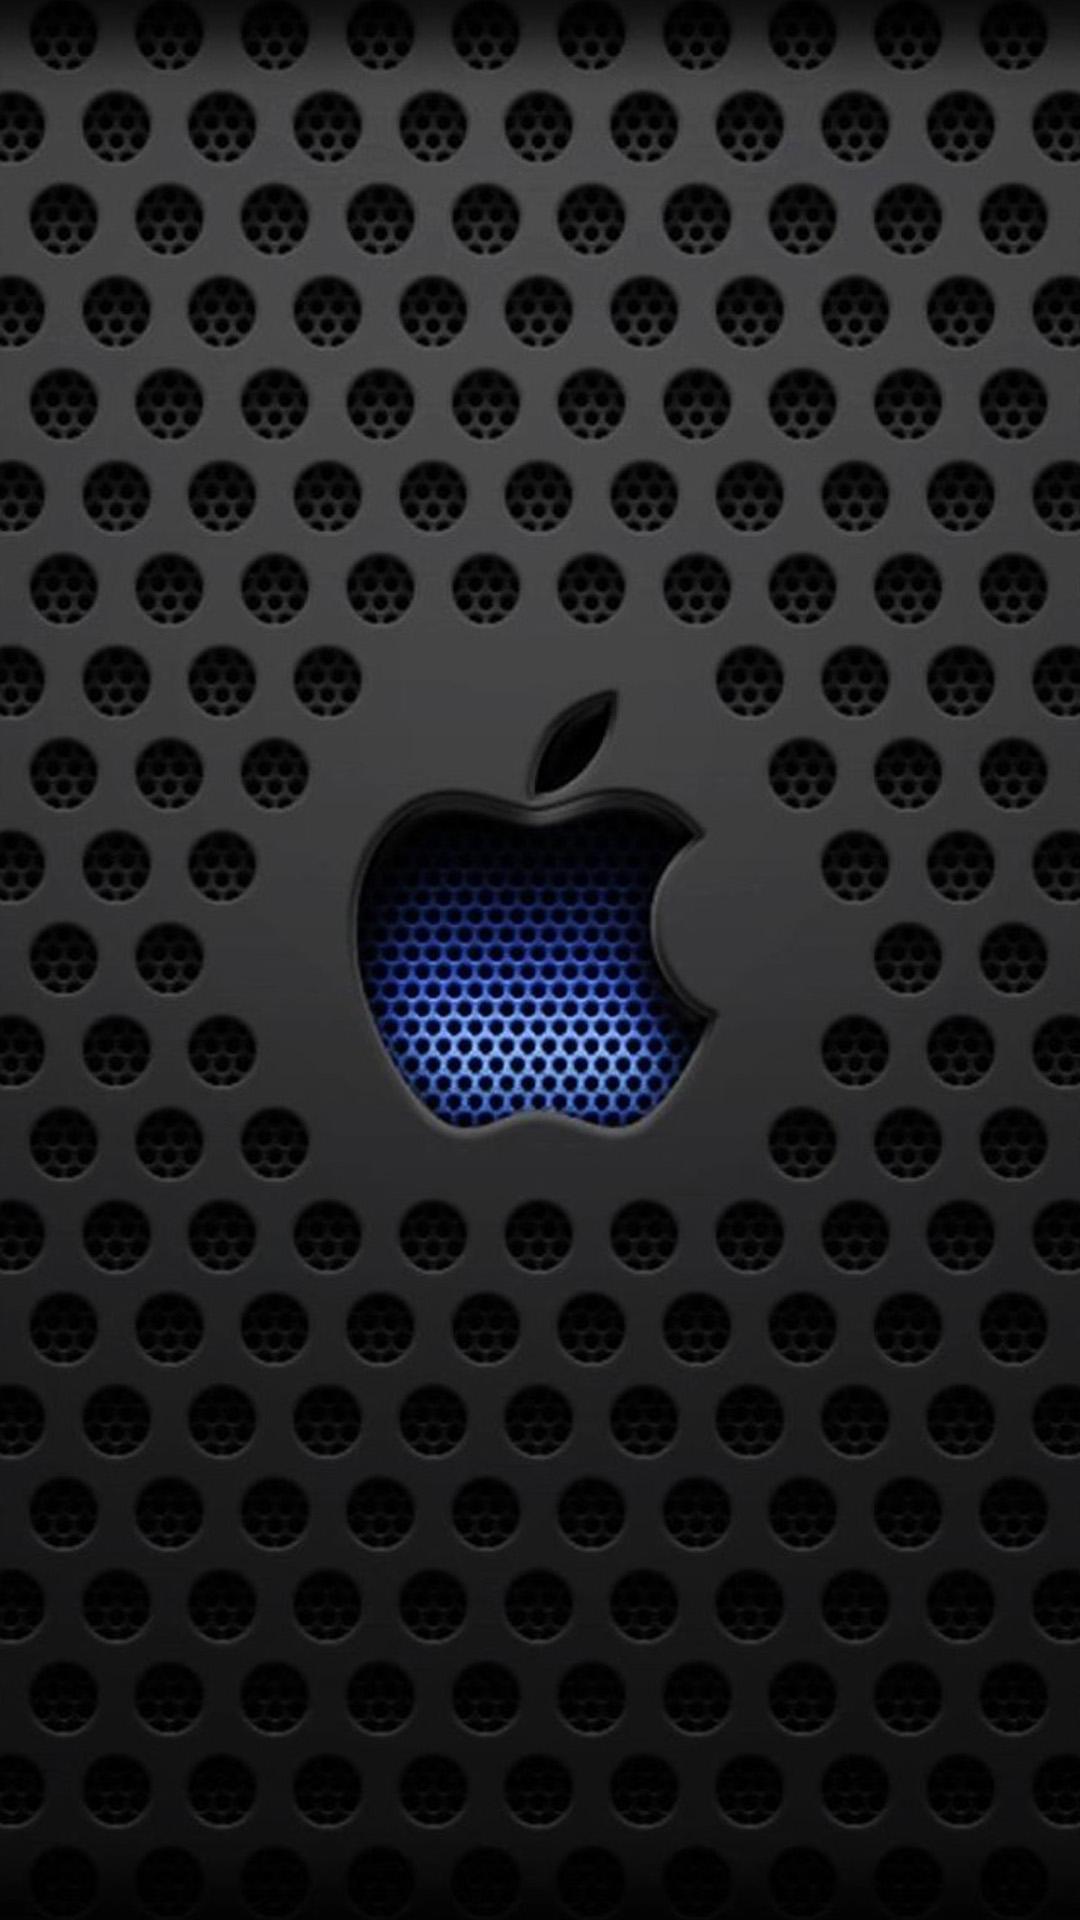 Apple iPhone 6 Plus Wallpaper 98 iPhone 6 Plus Wallpapers HD 1080x1920